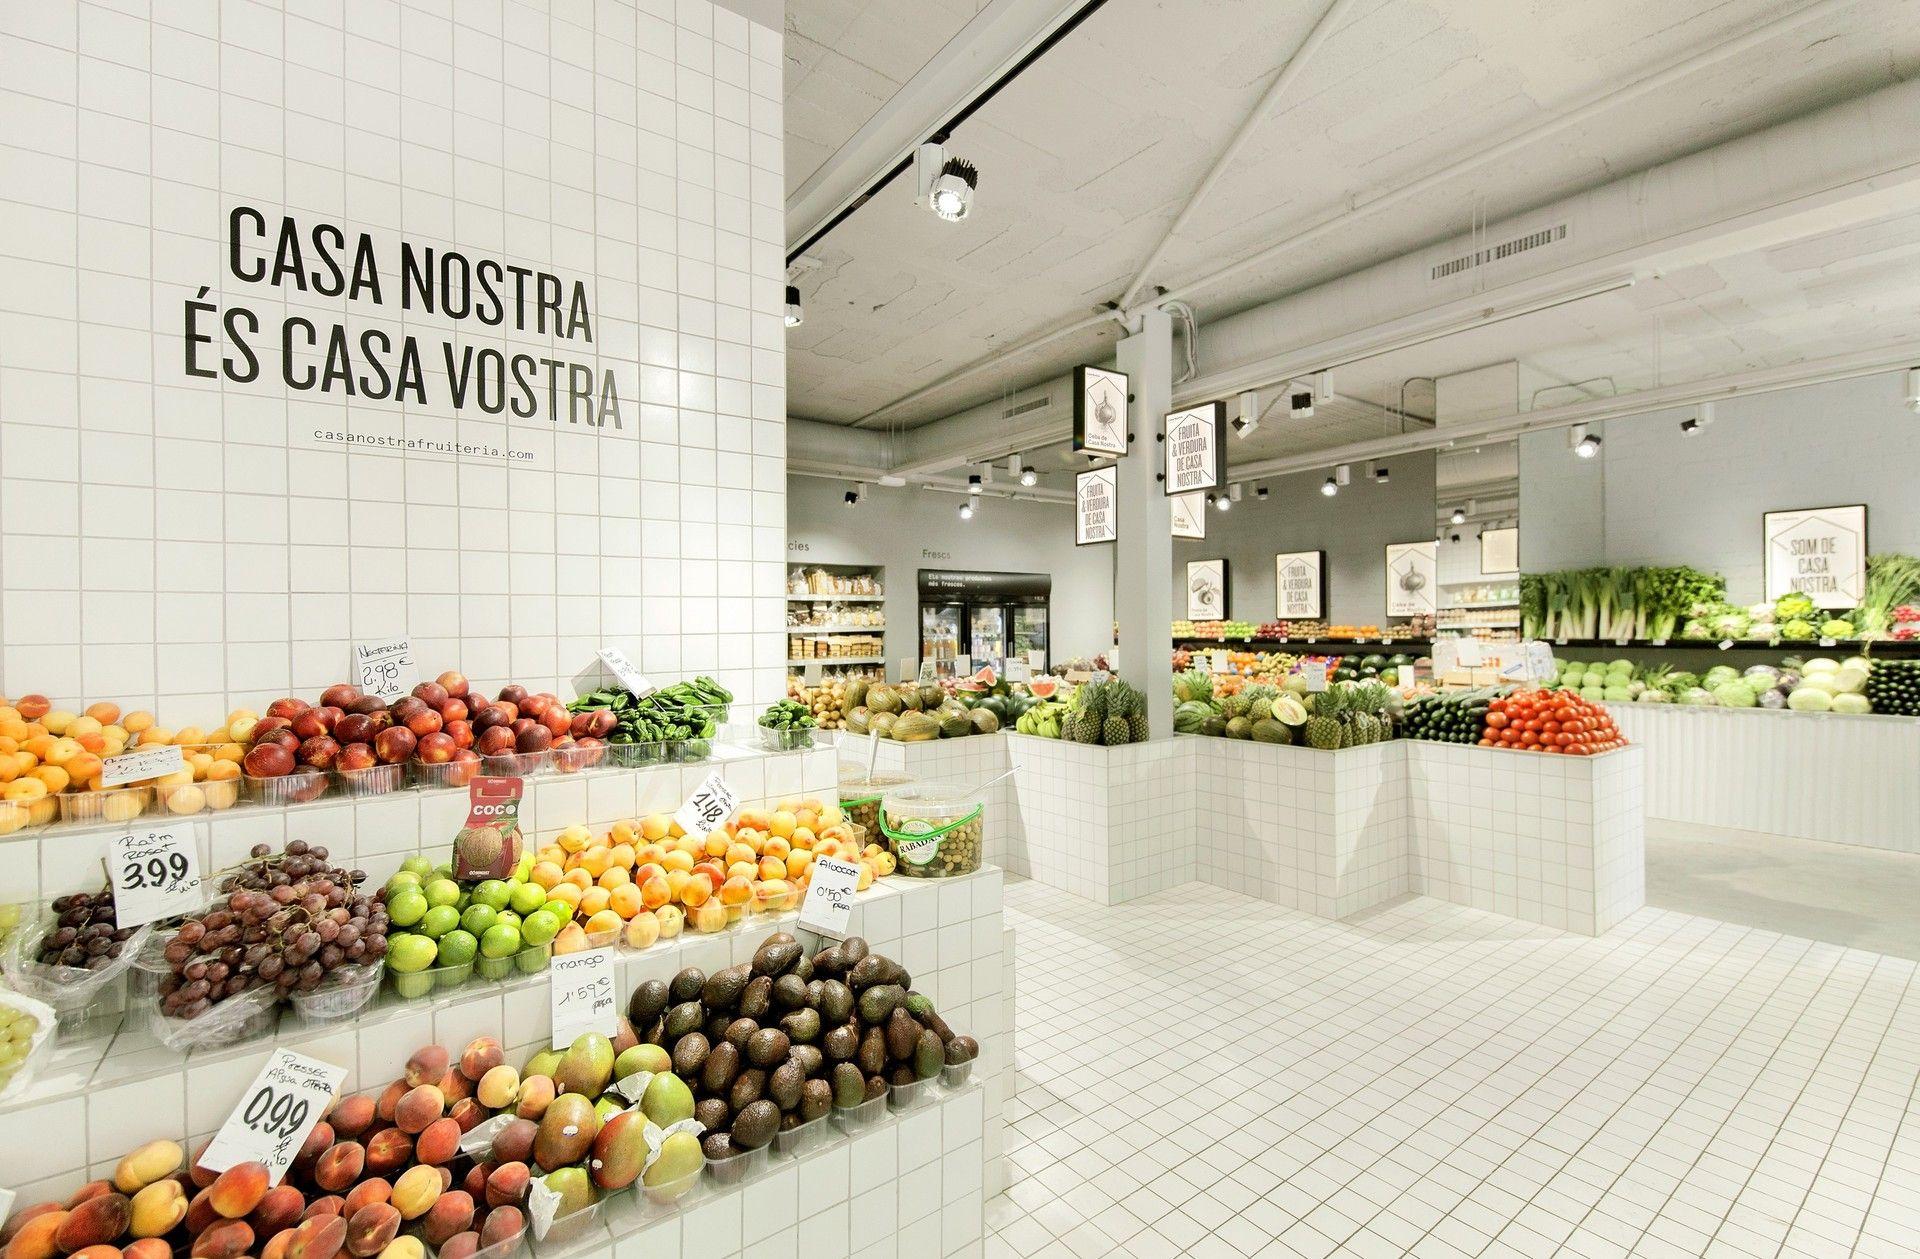 Casa nostra by miriam barrio frutta pinterest fruit - Miriam barrio ...